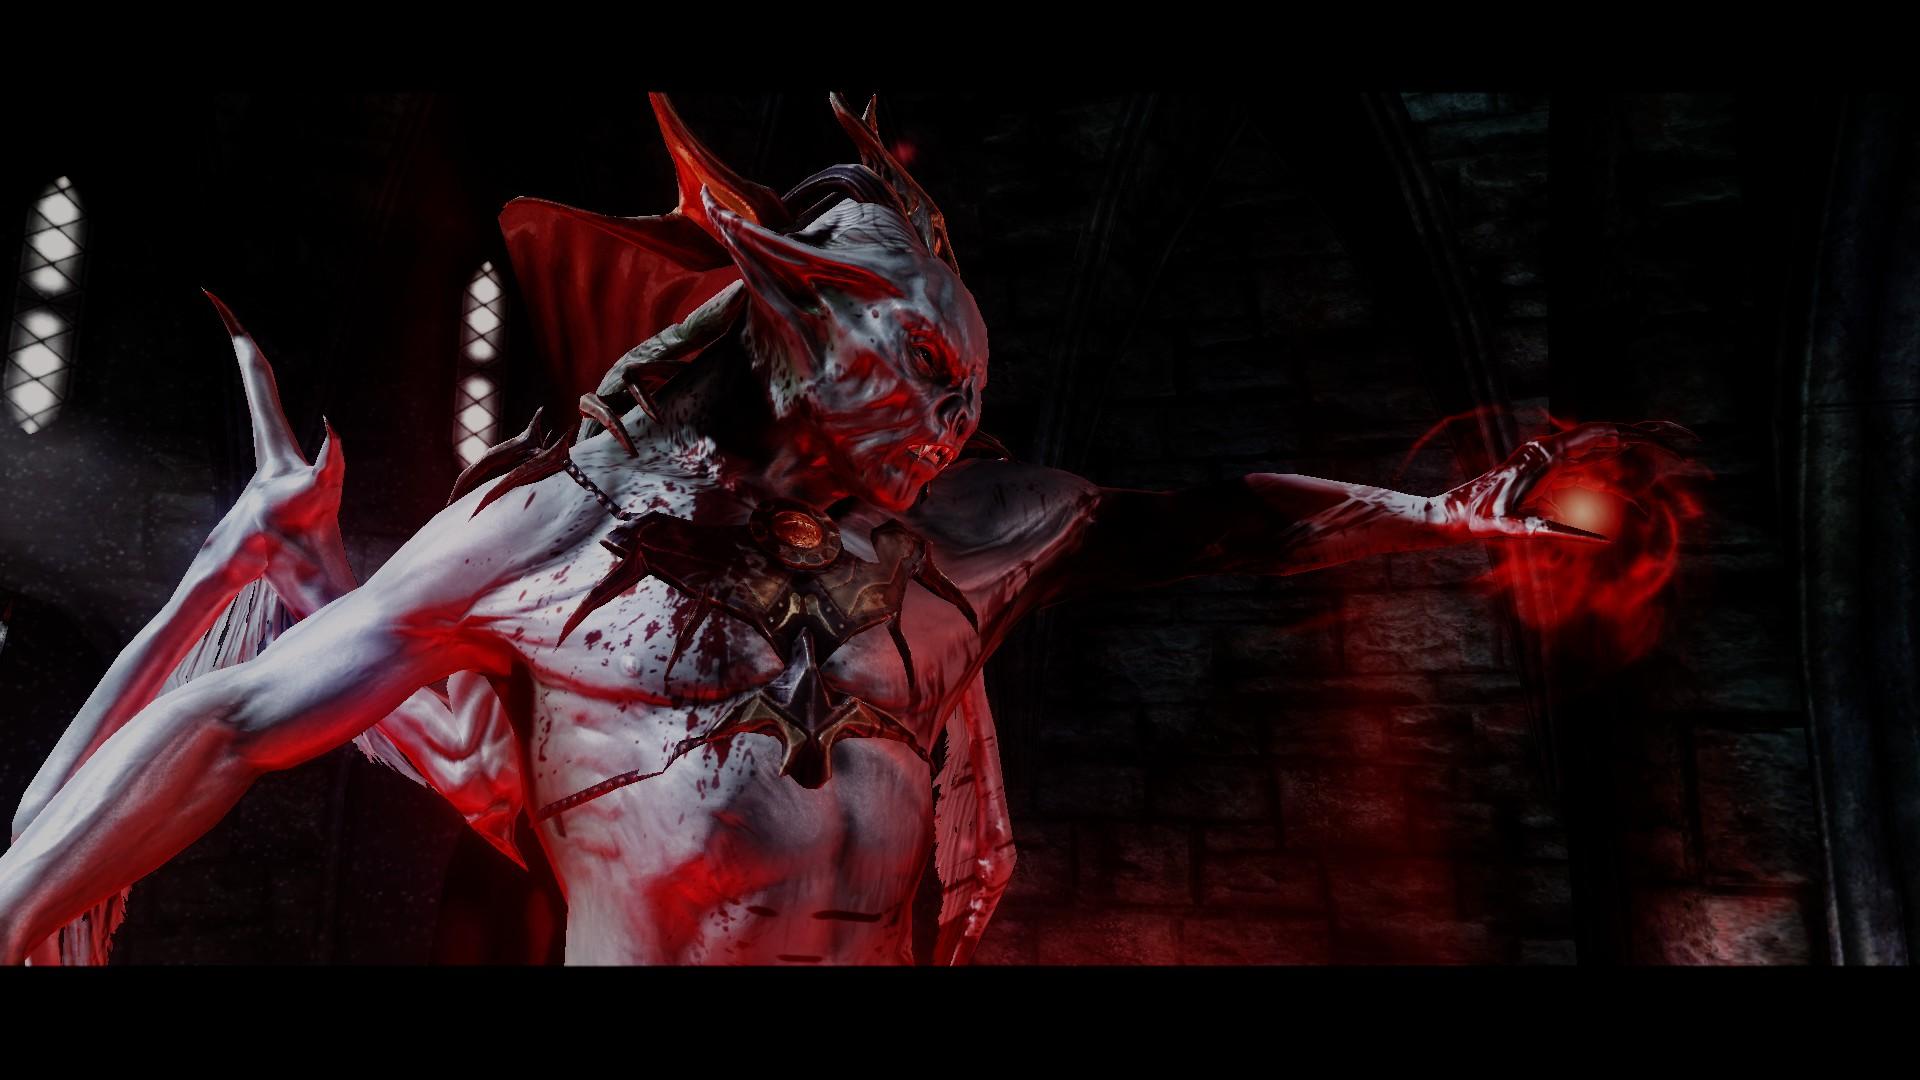 skyrim vampire wallpaper - photo #19